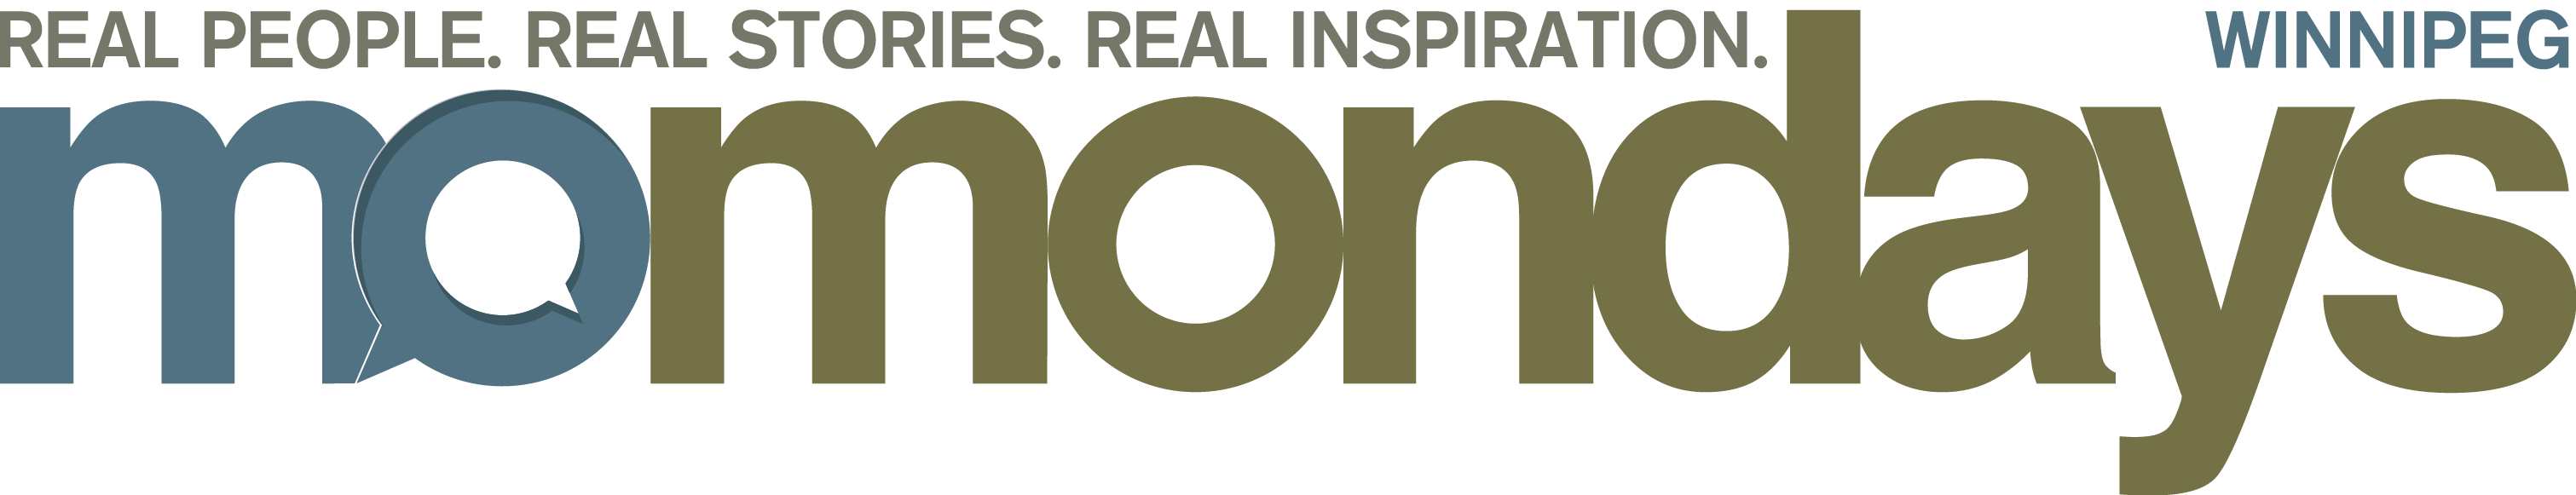 momondayss WINNIPEG logo 2 black background